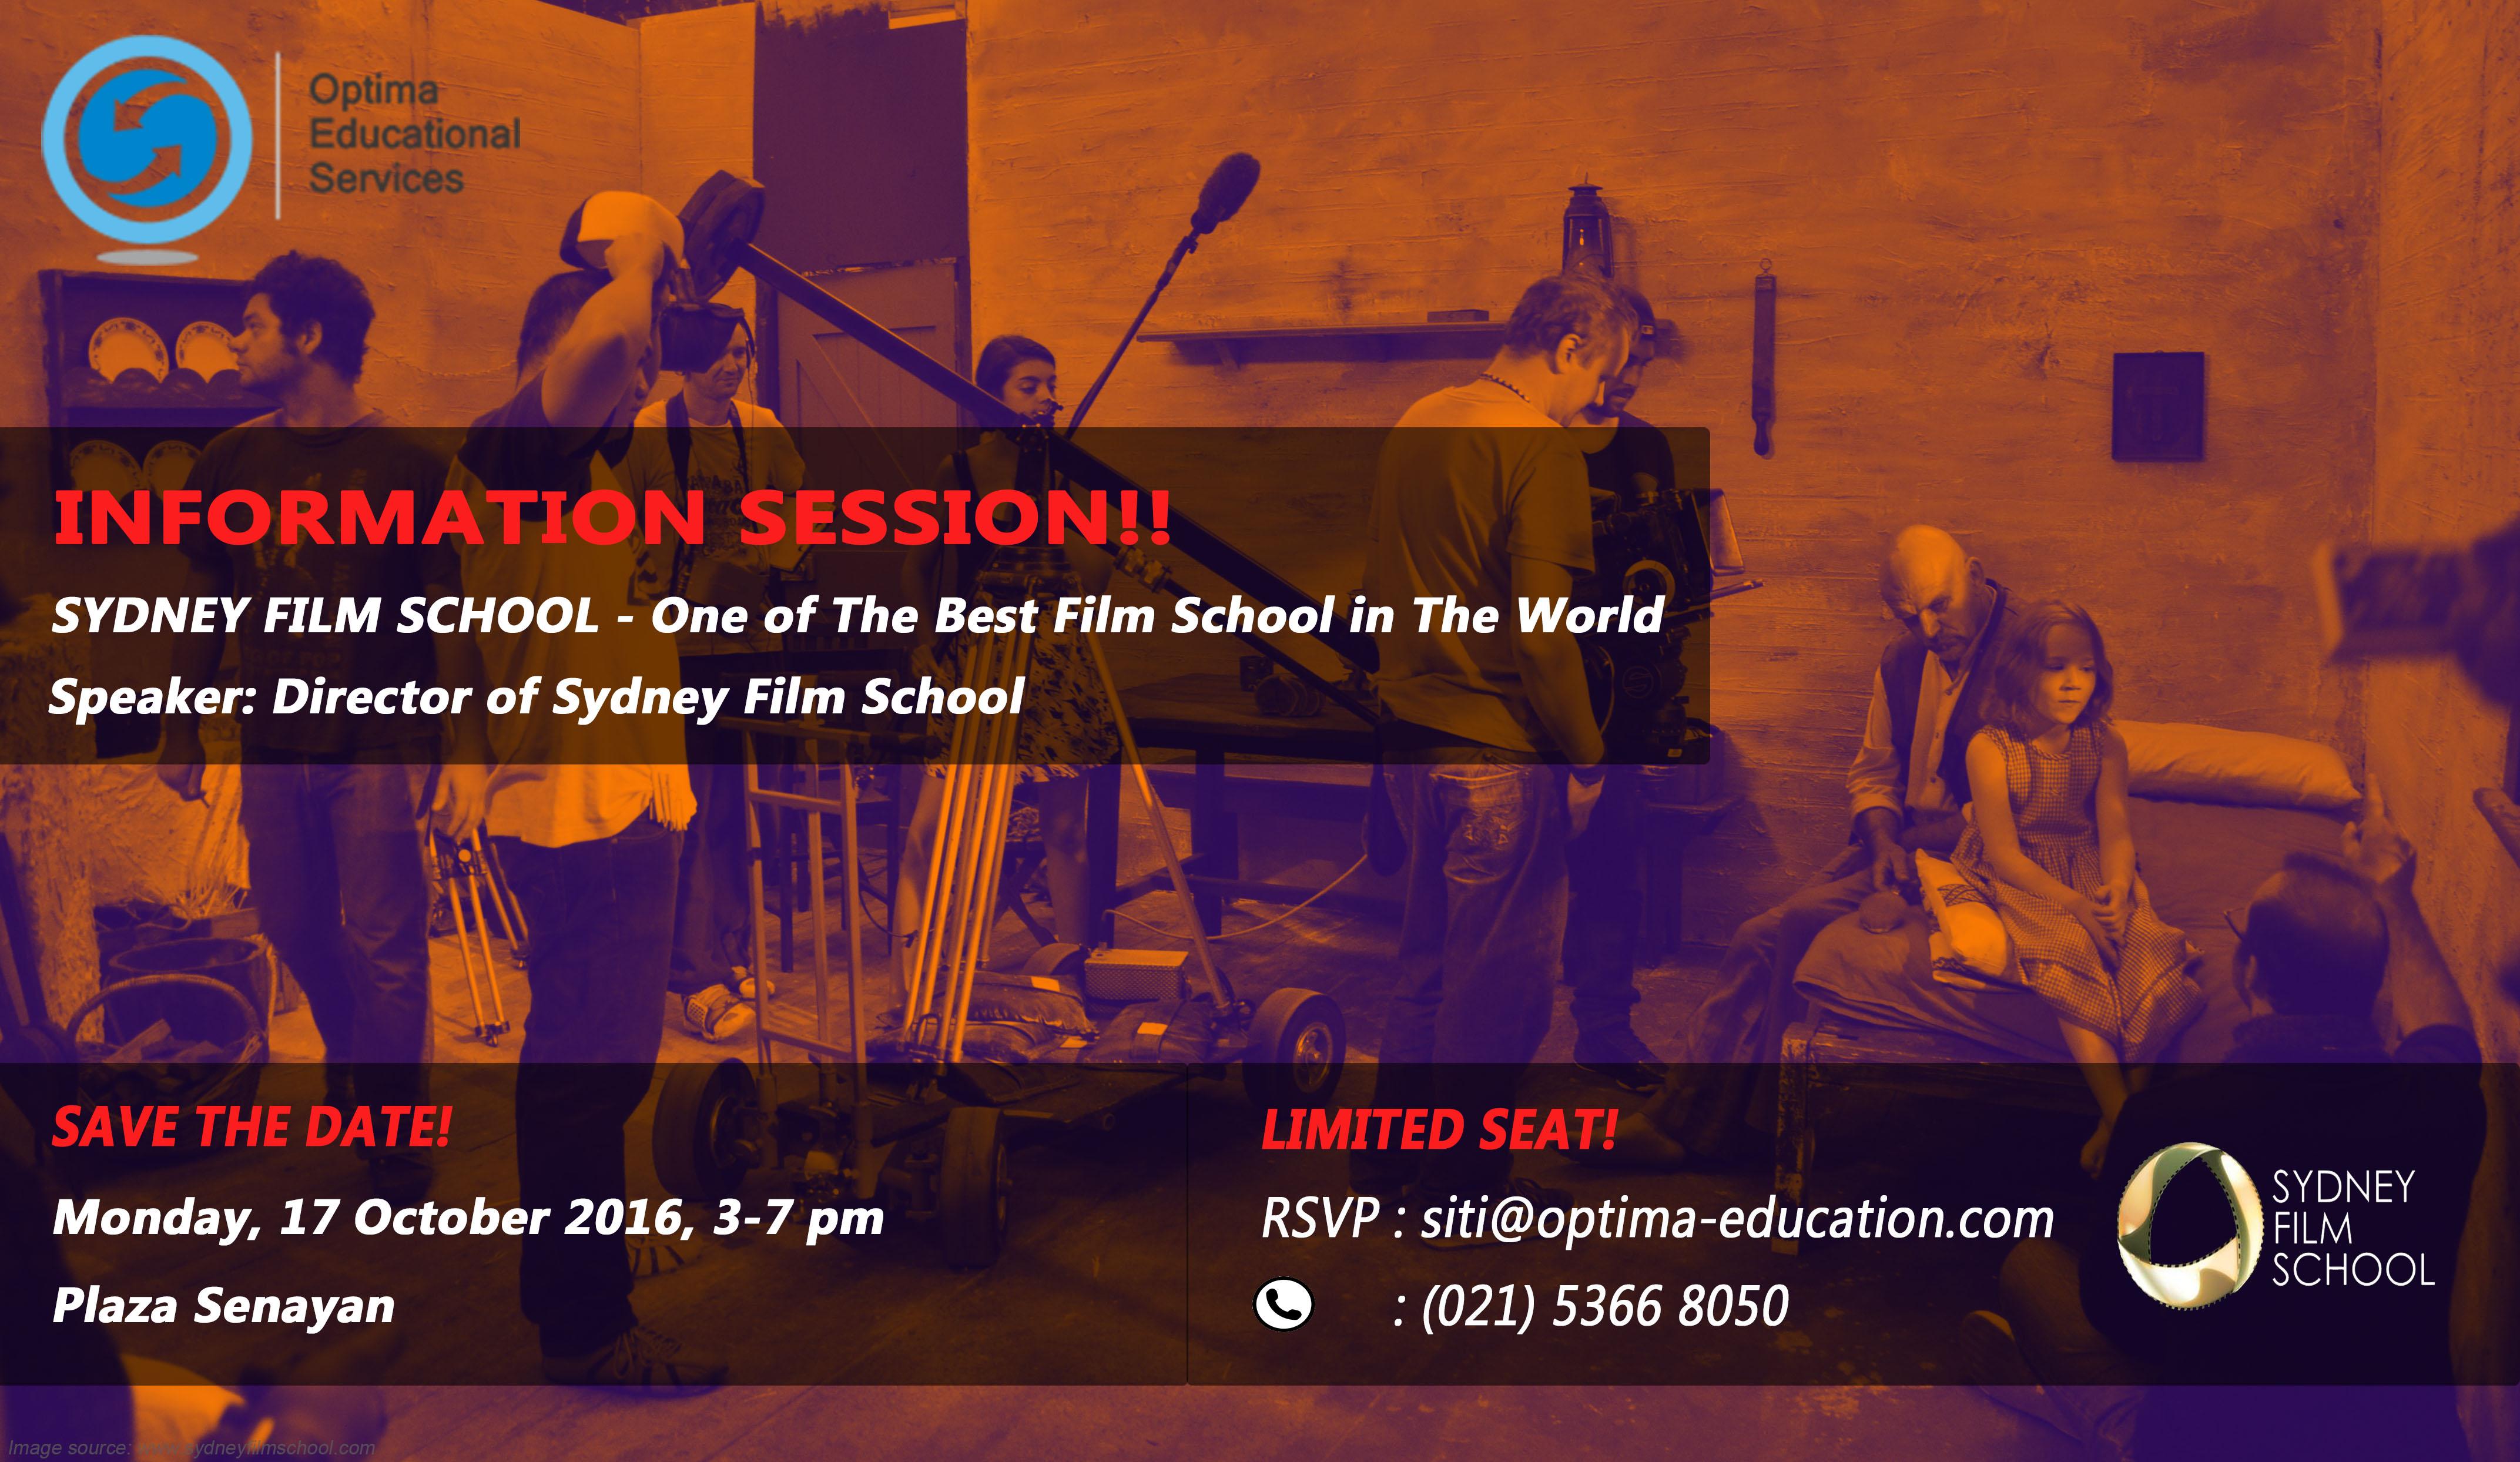 Banner-Info-Session-Sydney-Film-School-FINAL